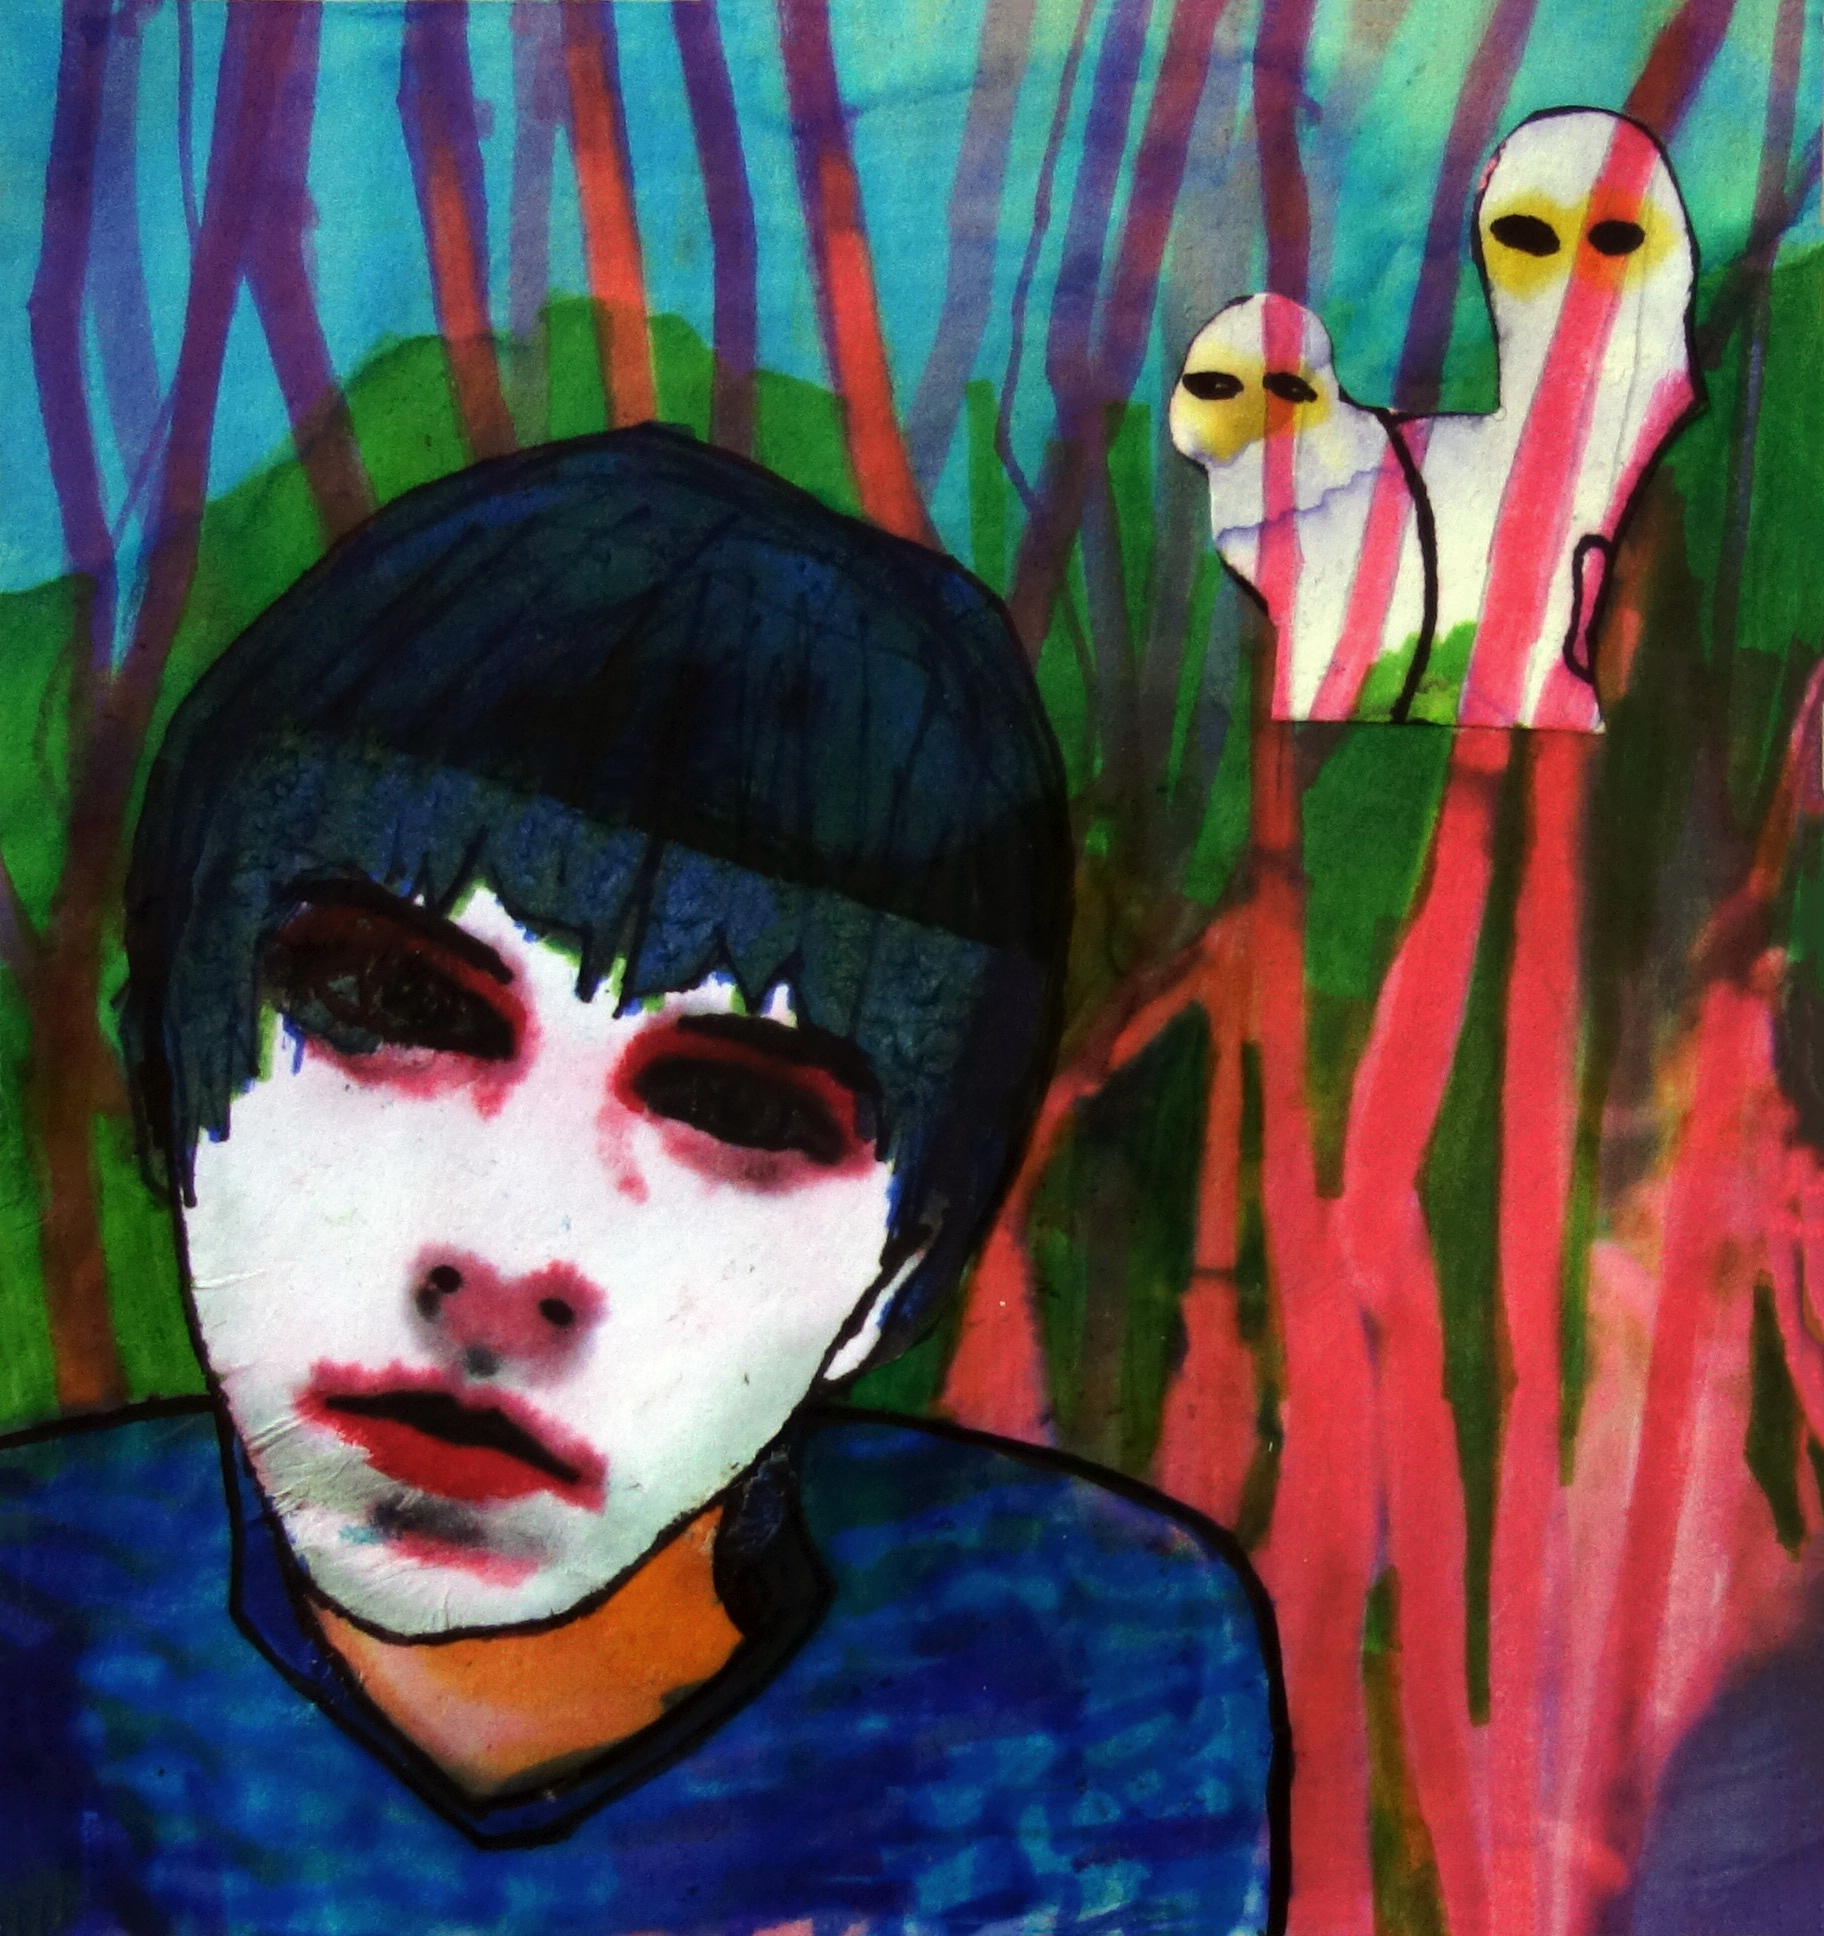 Boy in the grass